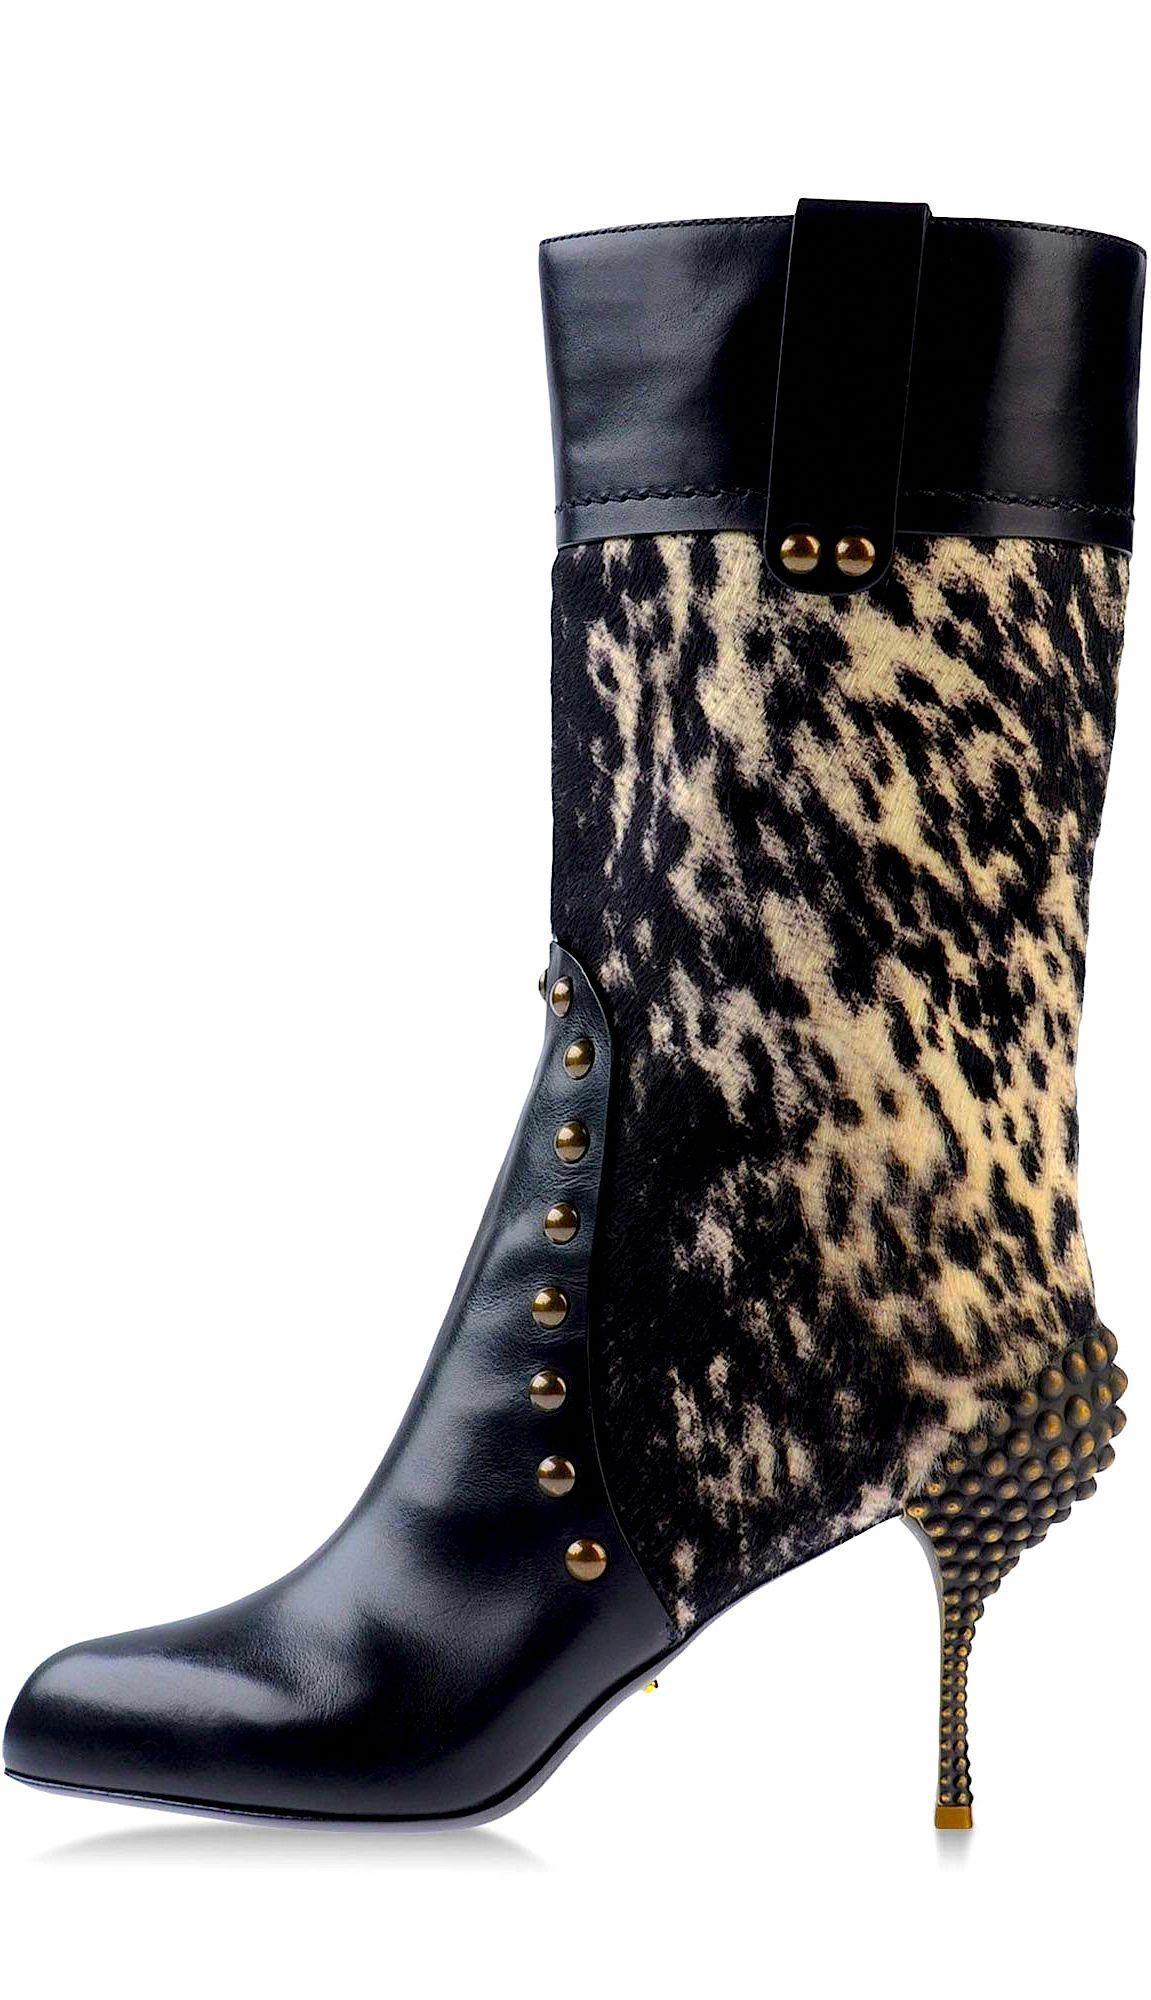 06eab83e7b0 Sergio Rossi... shoes  boot  fur  leather  heel  SergioRossi ...